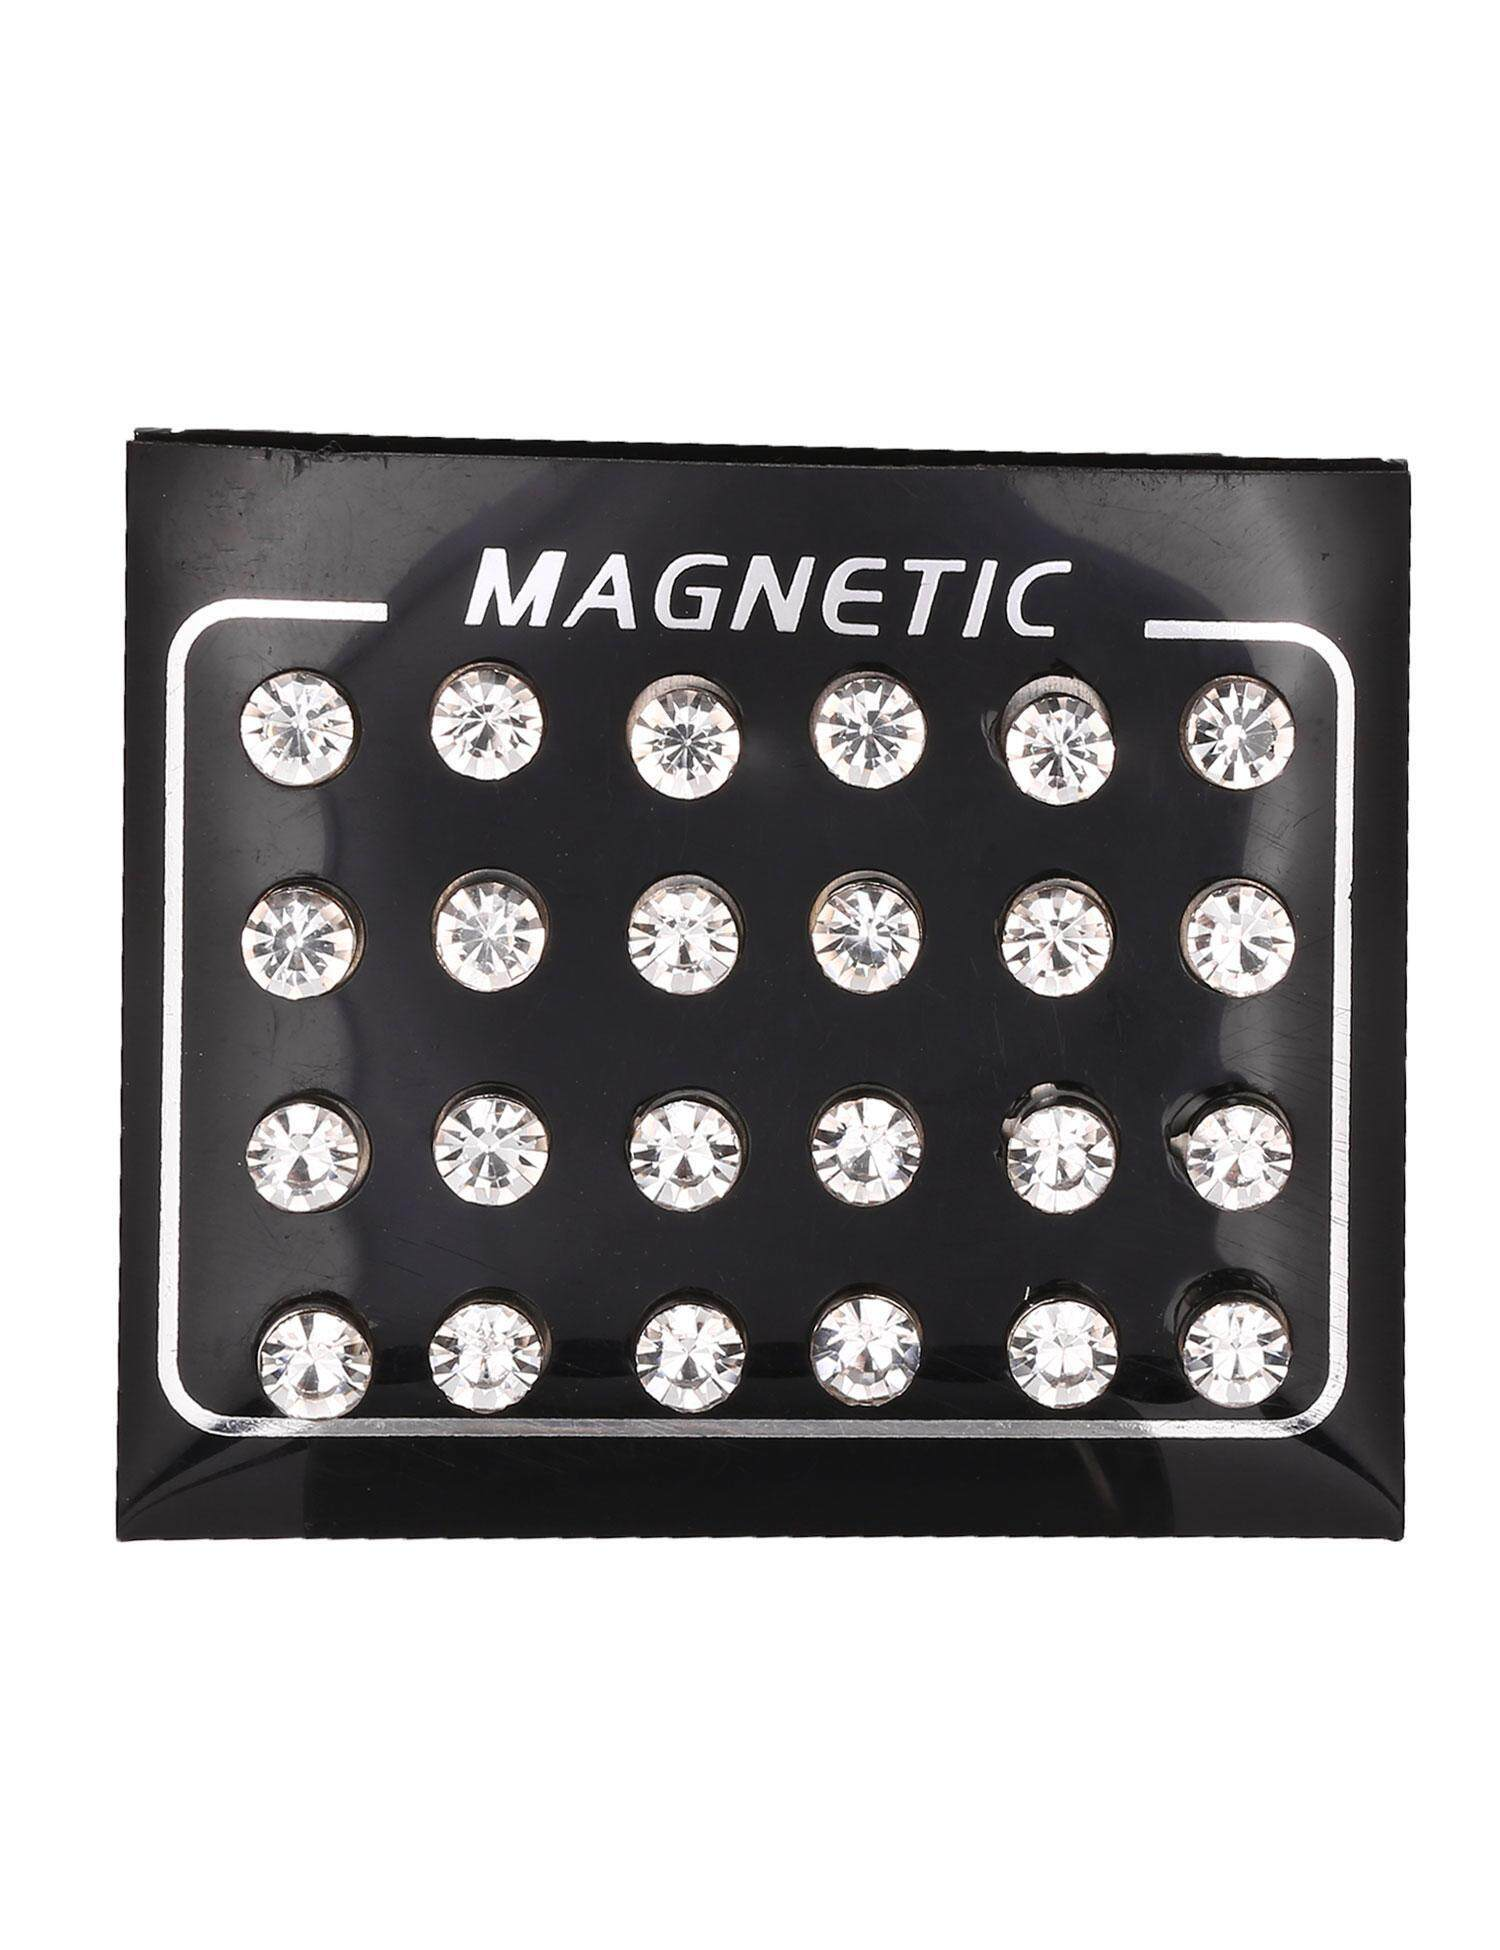 Baru Penjualan ASTAR Wanita Sepanjang Berlian Buatan Magnetik Telinga Stud Anting-Anting Magnet Telinga Stud Perhiasan-Internasional